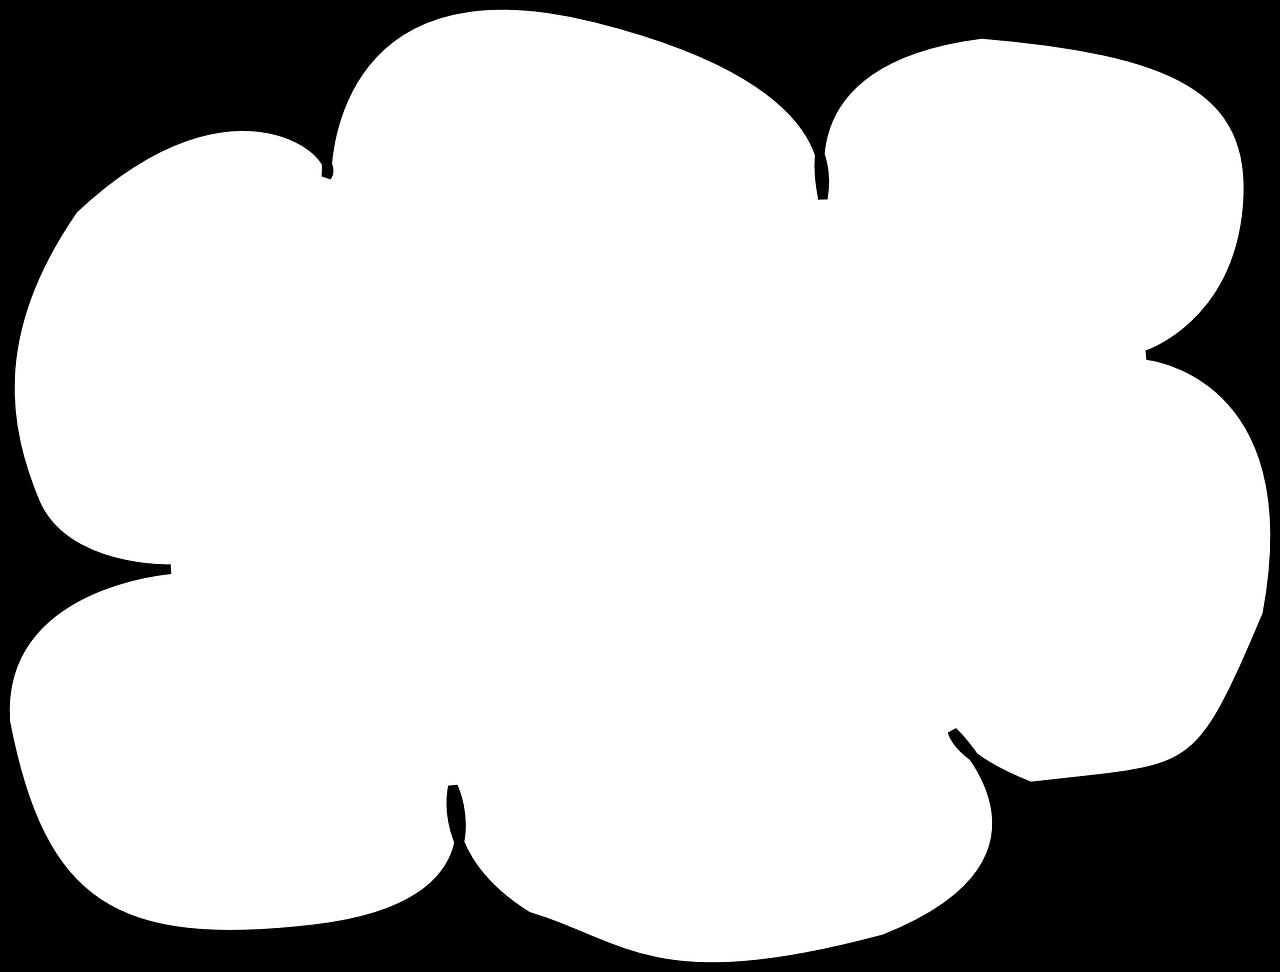 Cloud clipart cloud shape. How the growing internet